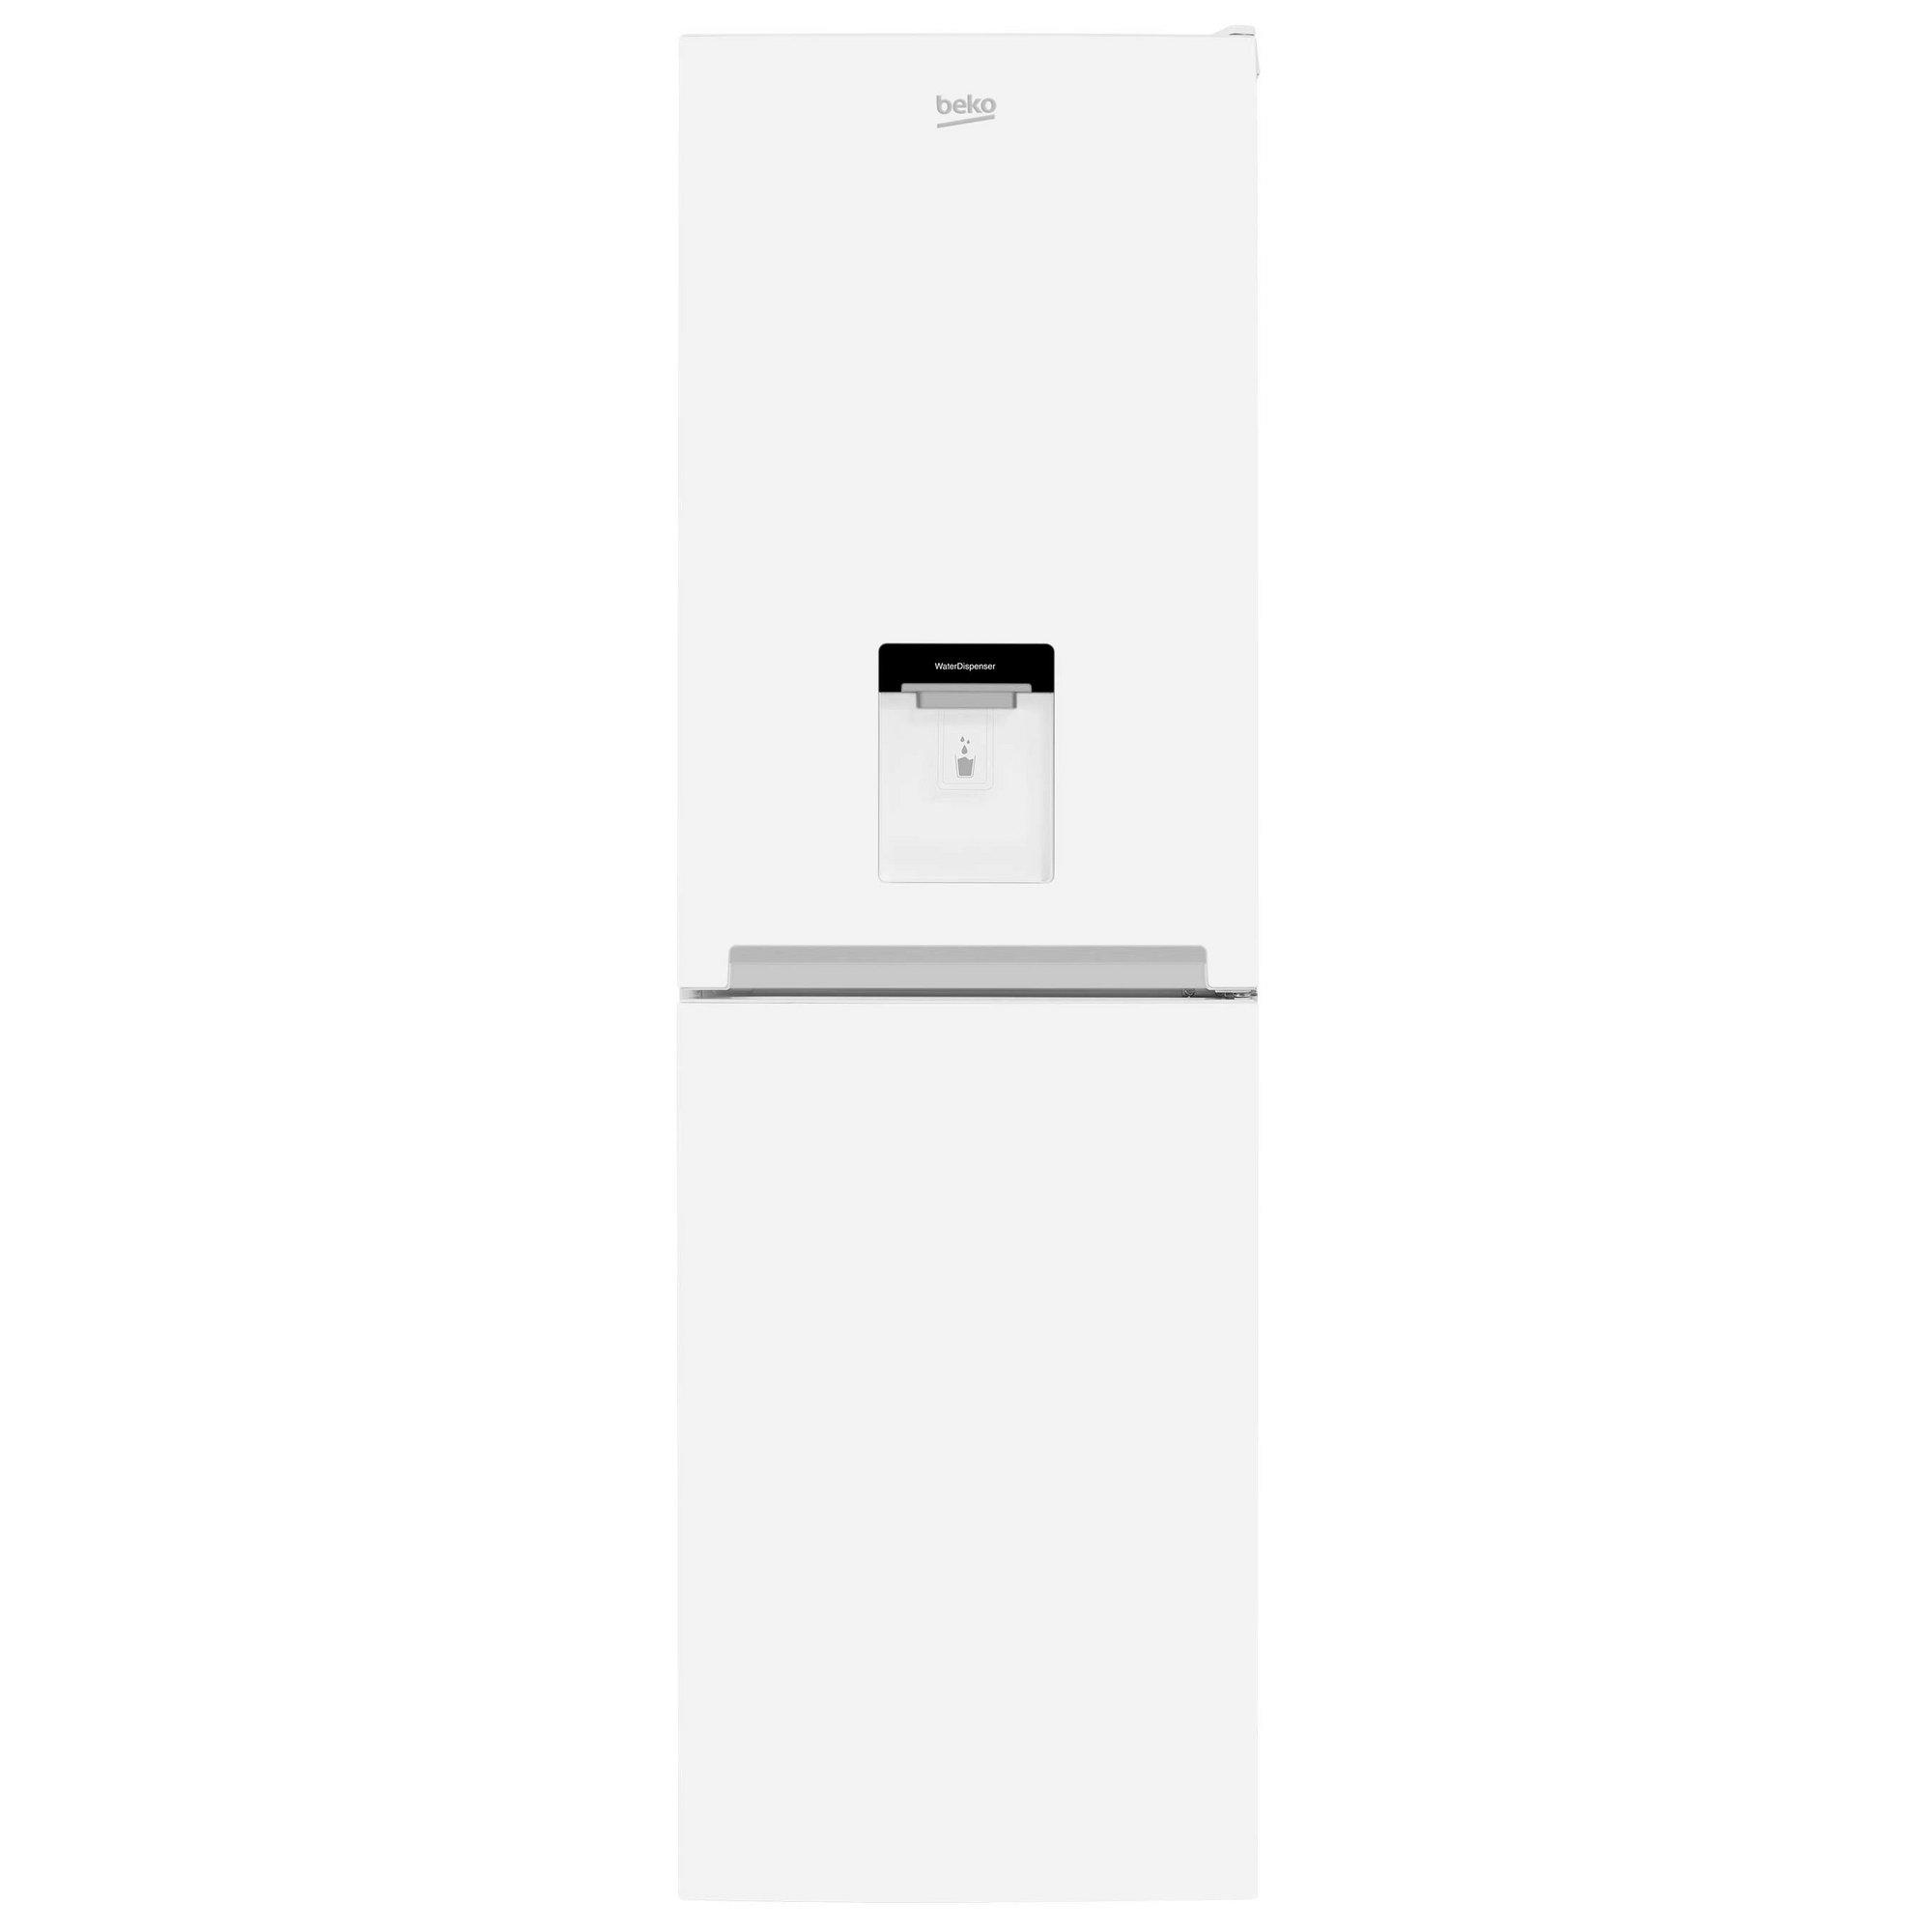 Image of Beko 182/54cm Frost Free Fridge Freezer with Water Dispenser